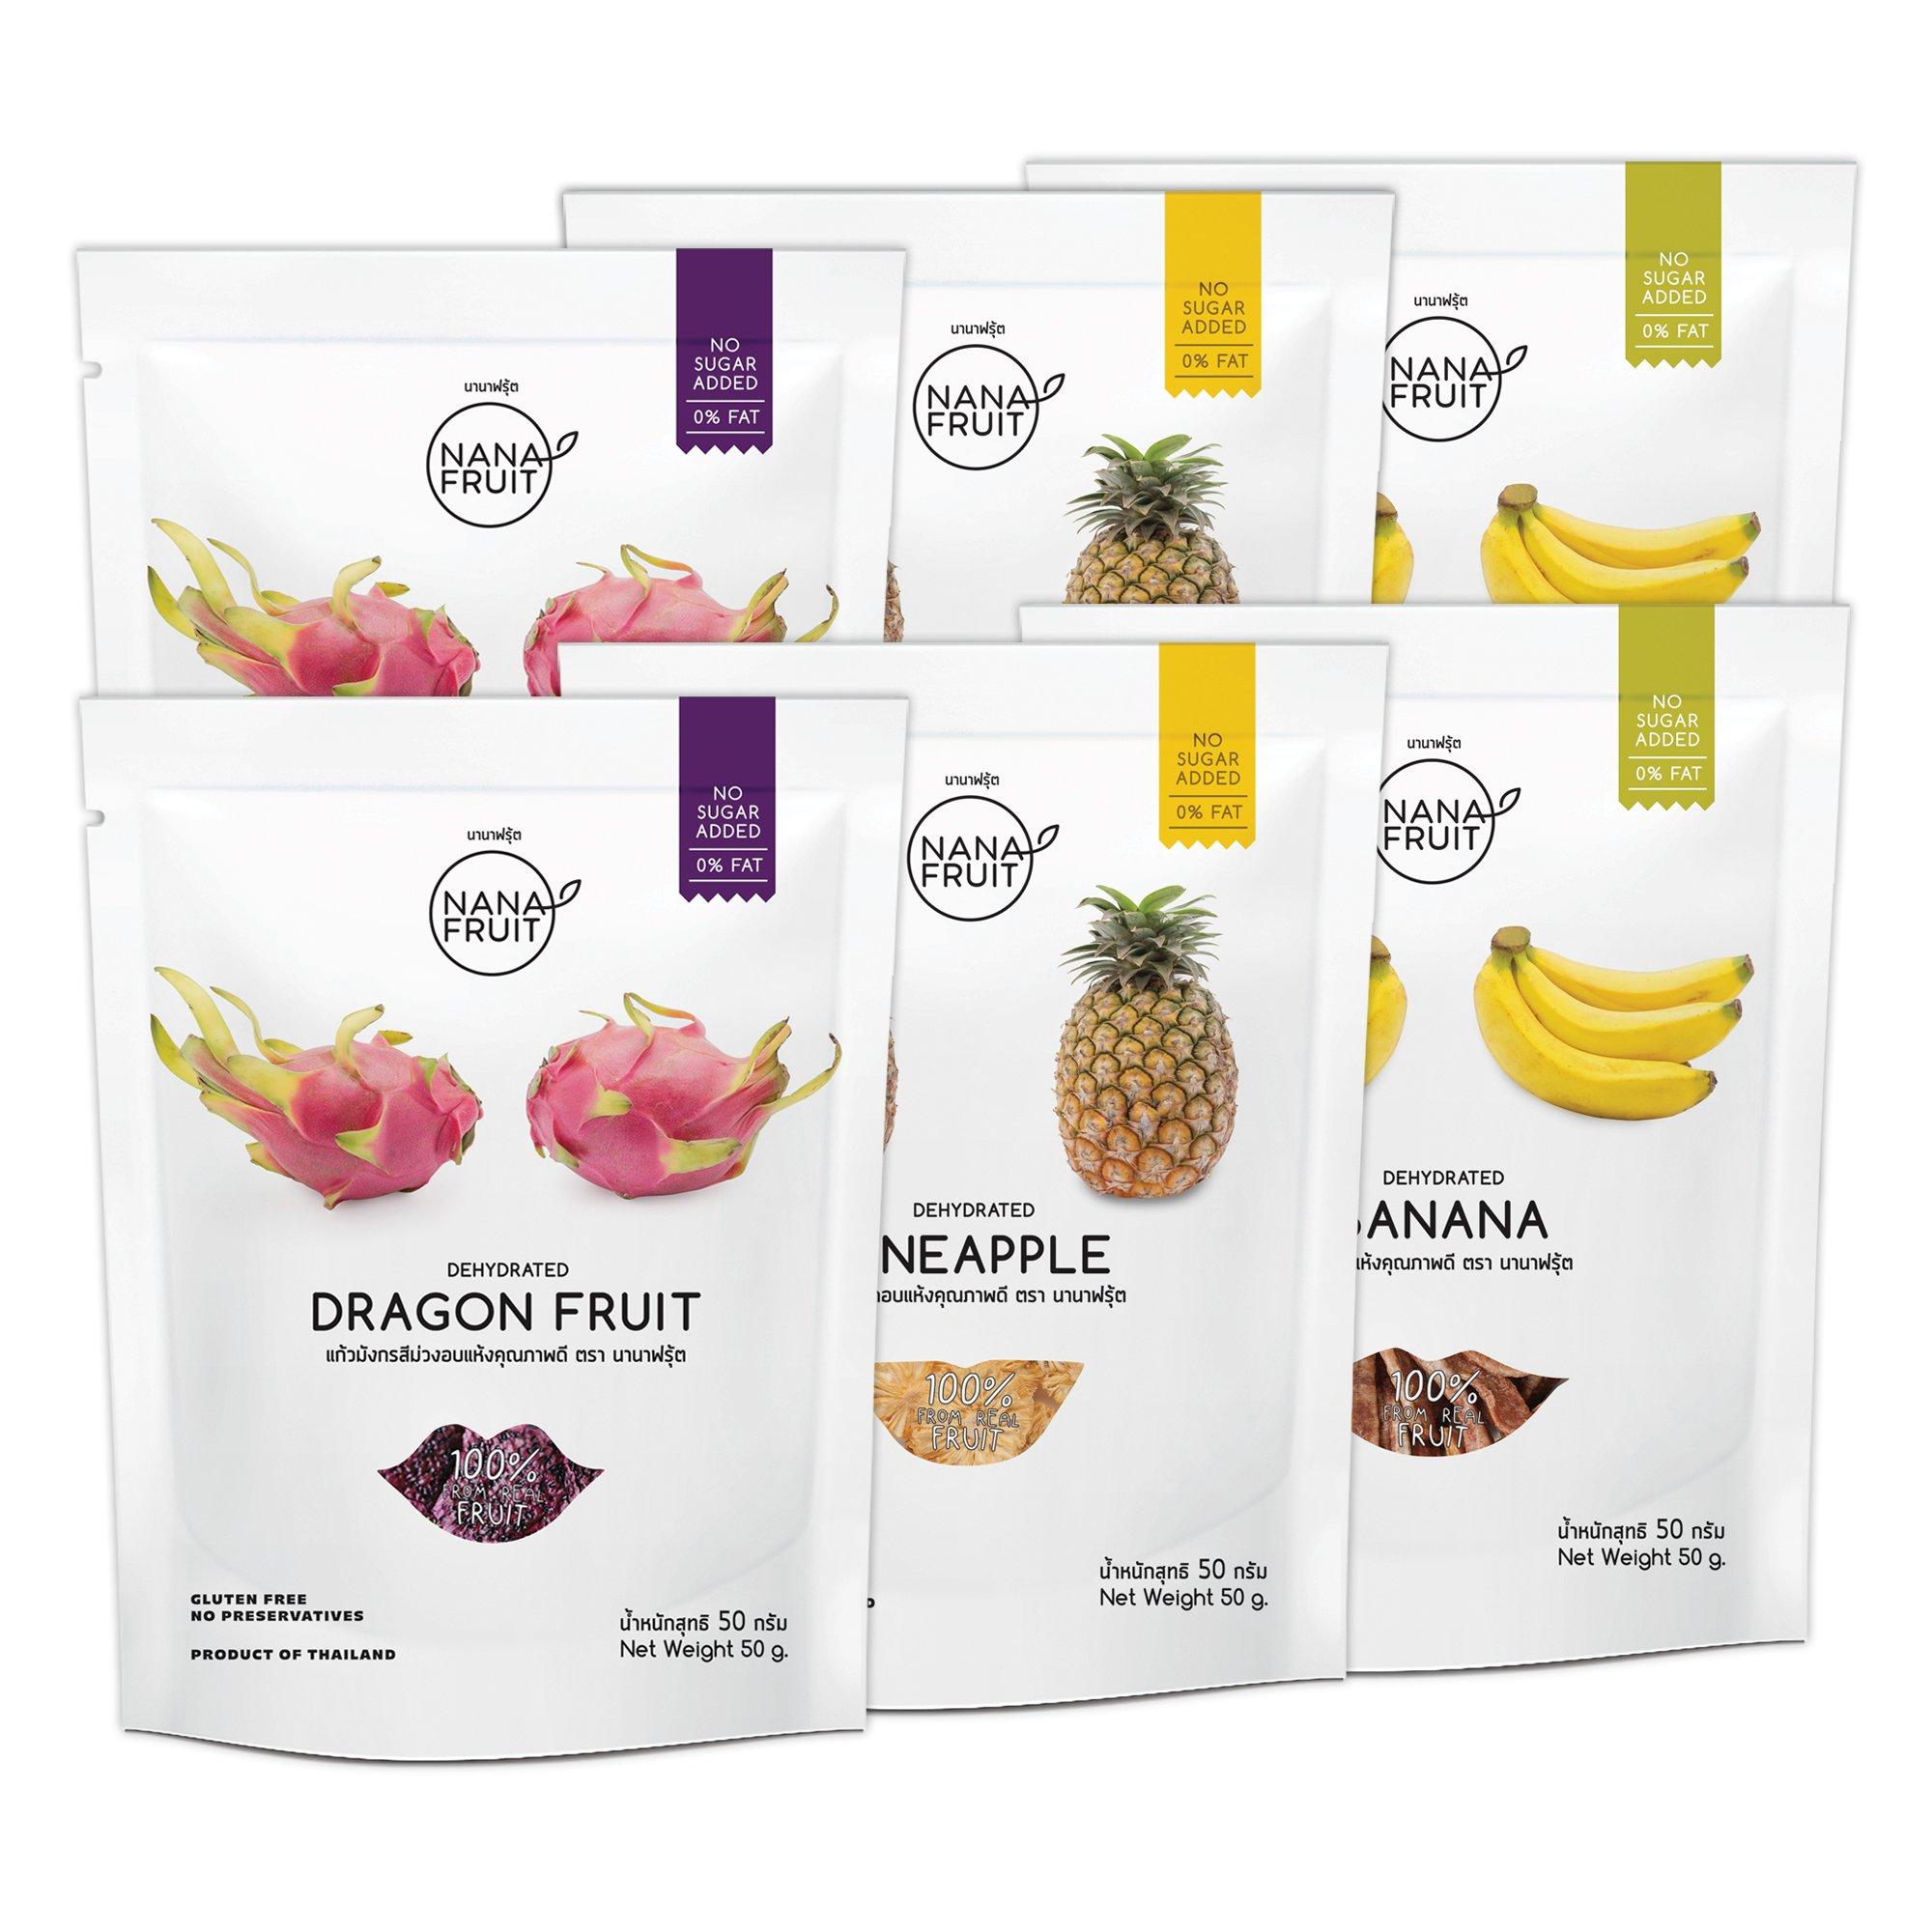 Nana Fruits Dried Dragon Fruit Pack 50g. (2 Pack) Pineapple Pack 50g. (2 Pack) and Banana Pack 50g. (2 Pack)